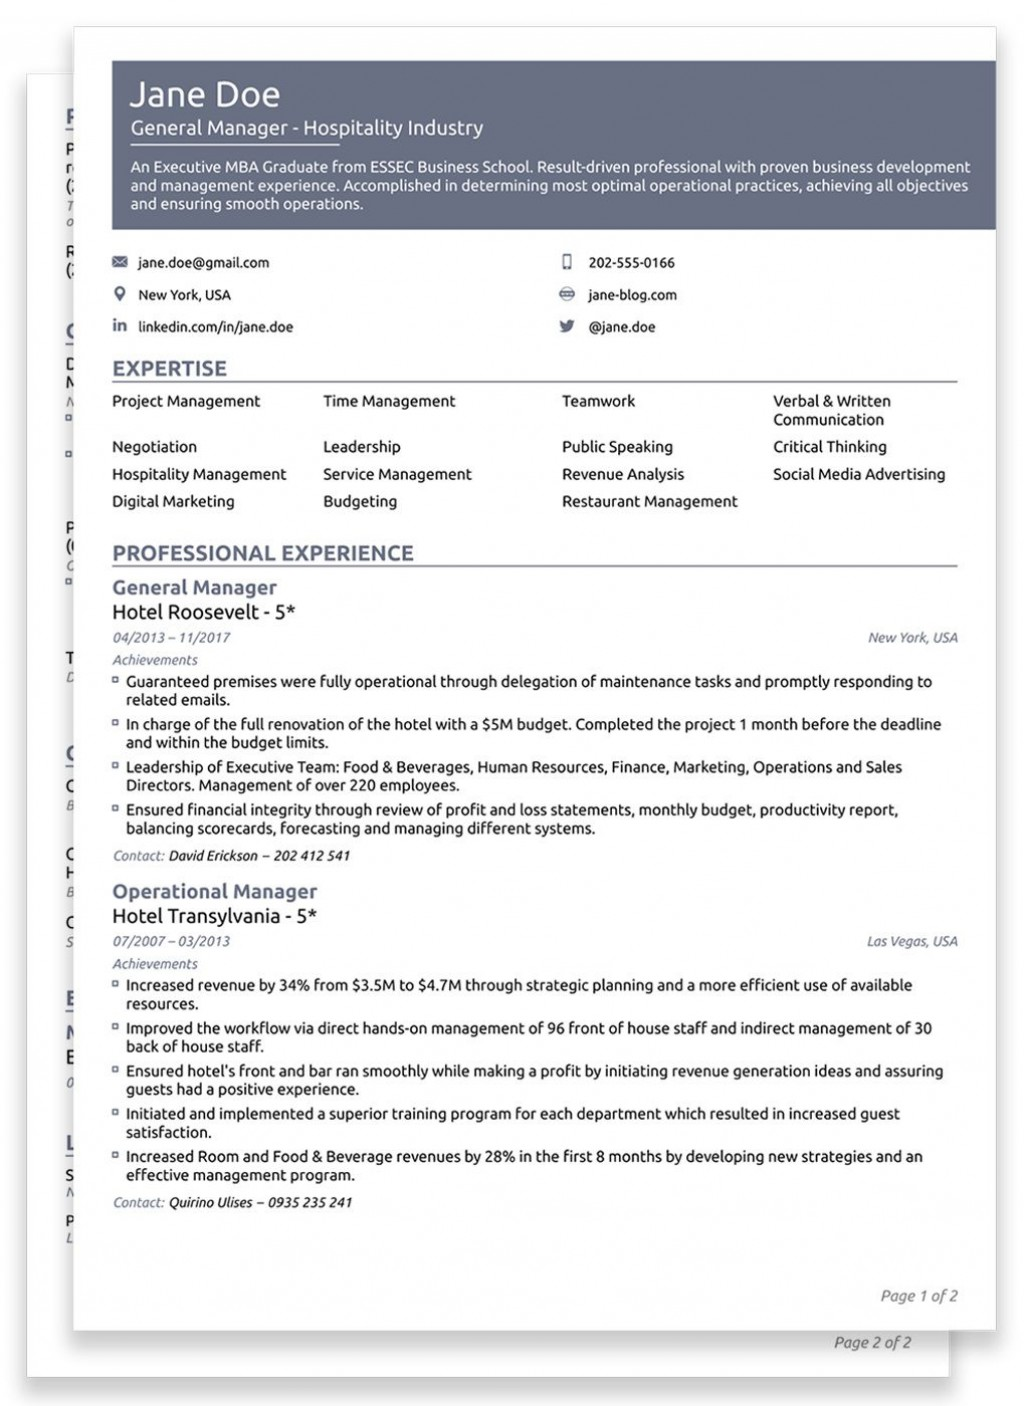 007 Unbelievable Best Professional Resume Template Image  Reddit 2020 DownloadLarge